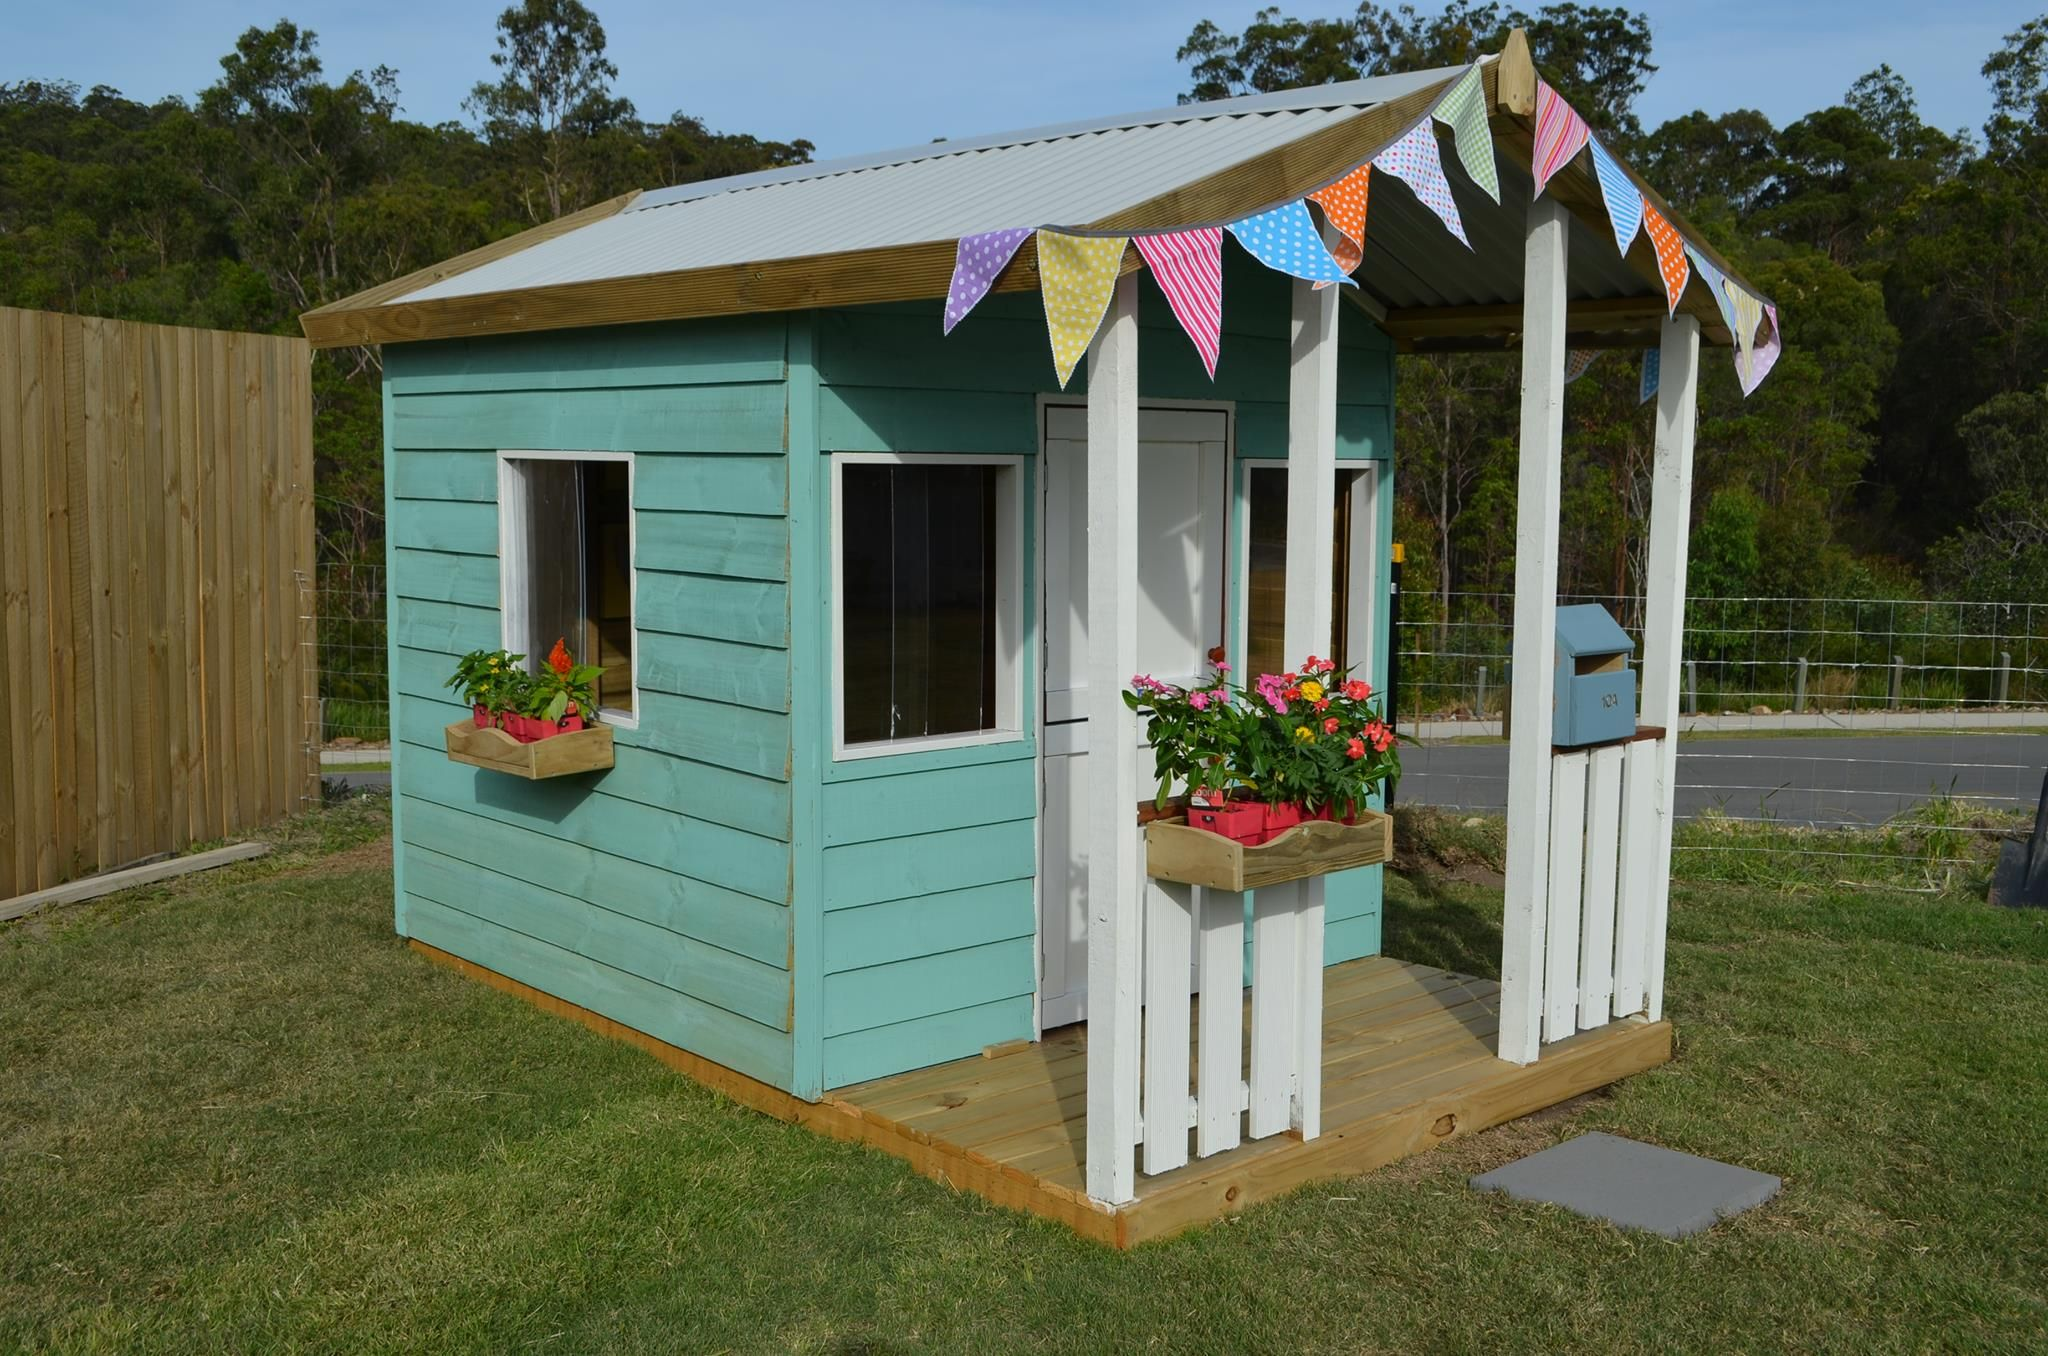 Cubby house paint scheme 39 s design tips cubby houses for Design a shed cubbies